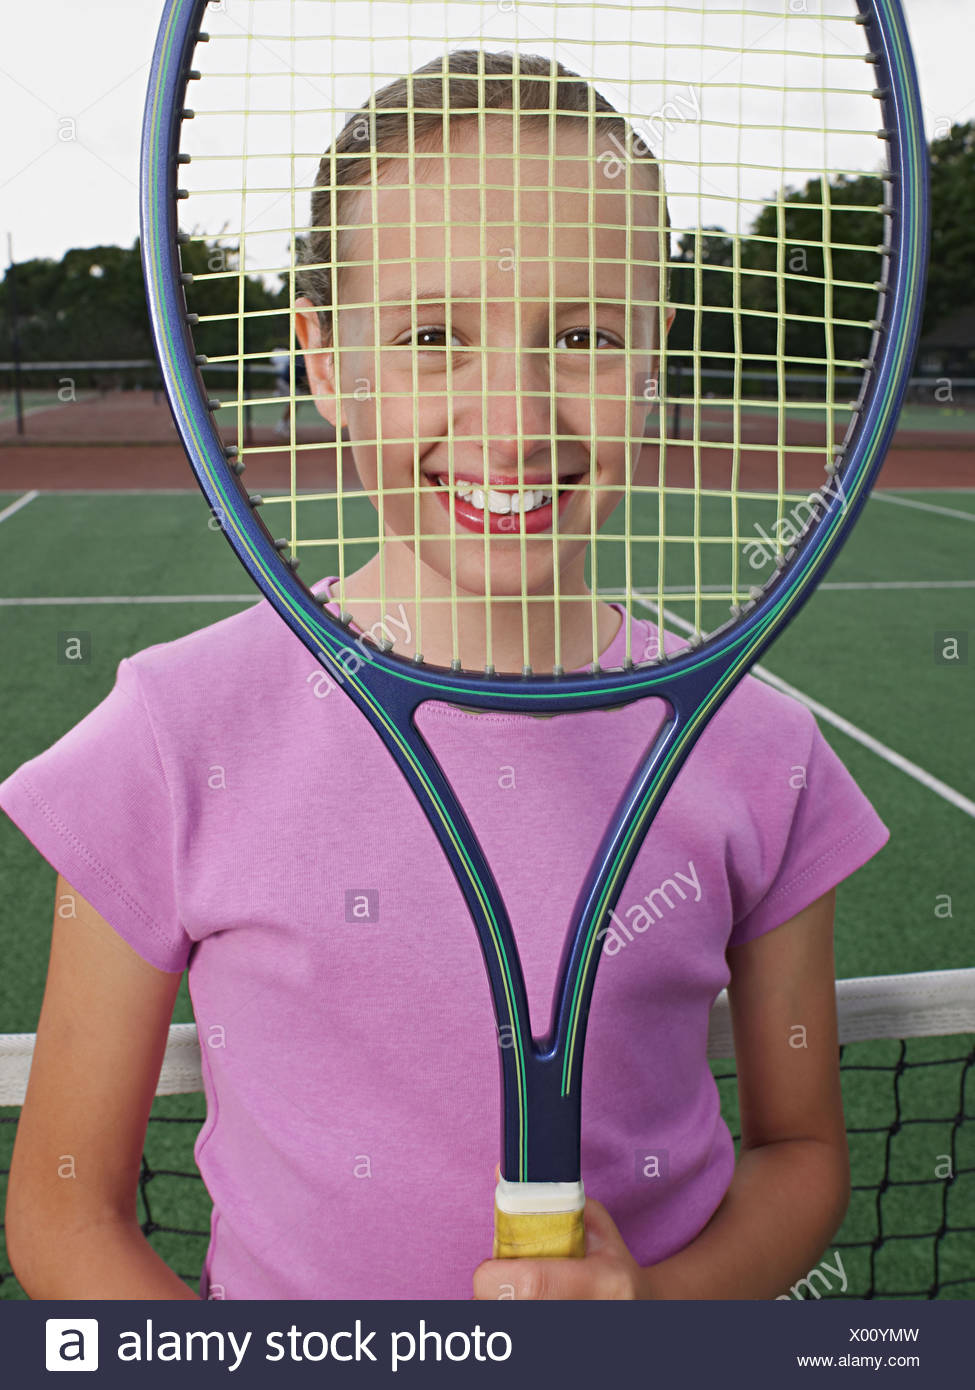 Chica sujetando una raqueta de tenis Foto de stock